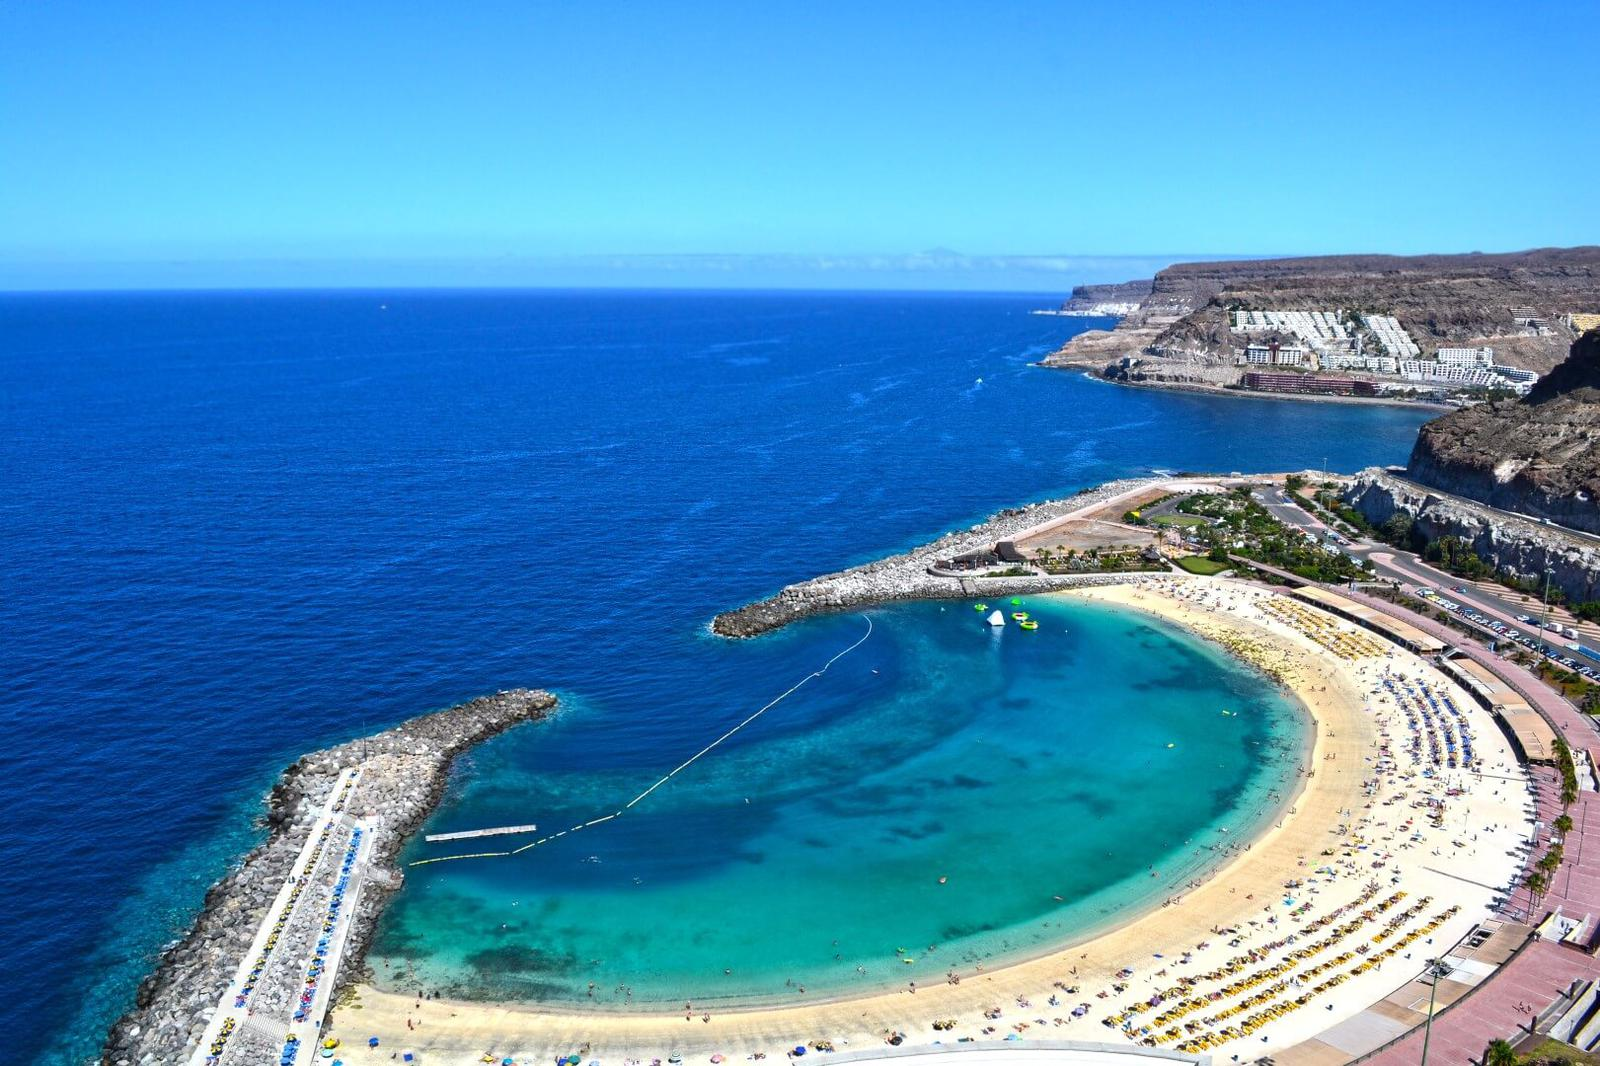 Spain_Canary Islands_Gran Canaria_Fotolia (1)